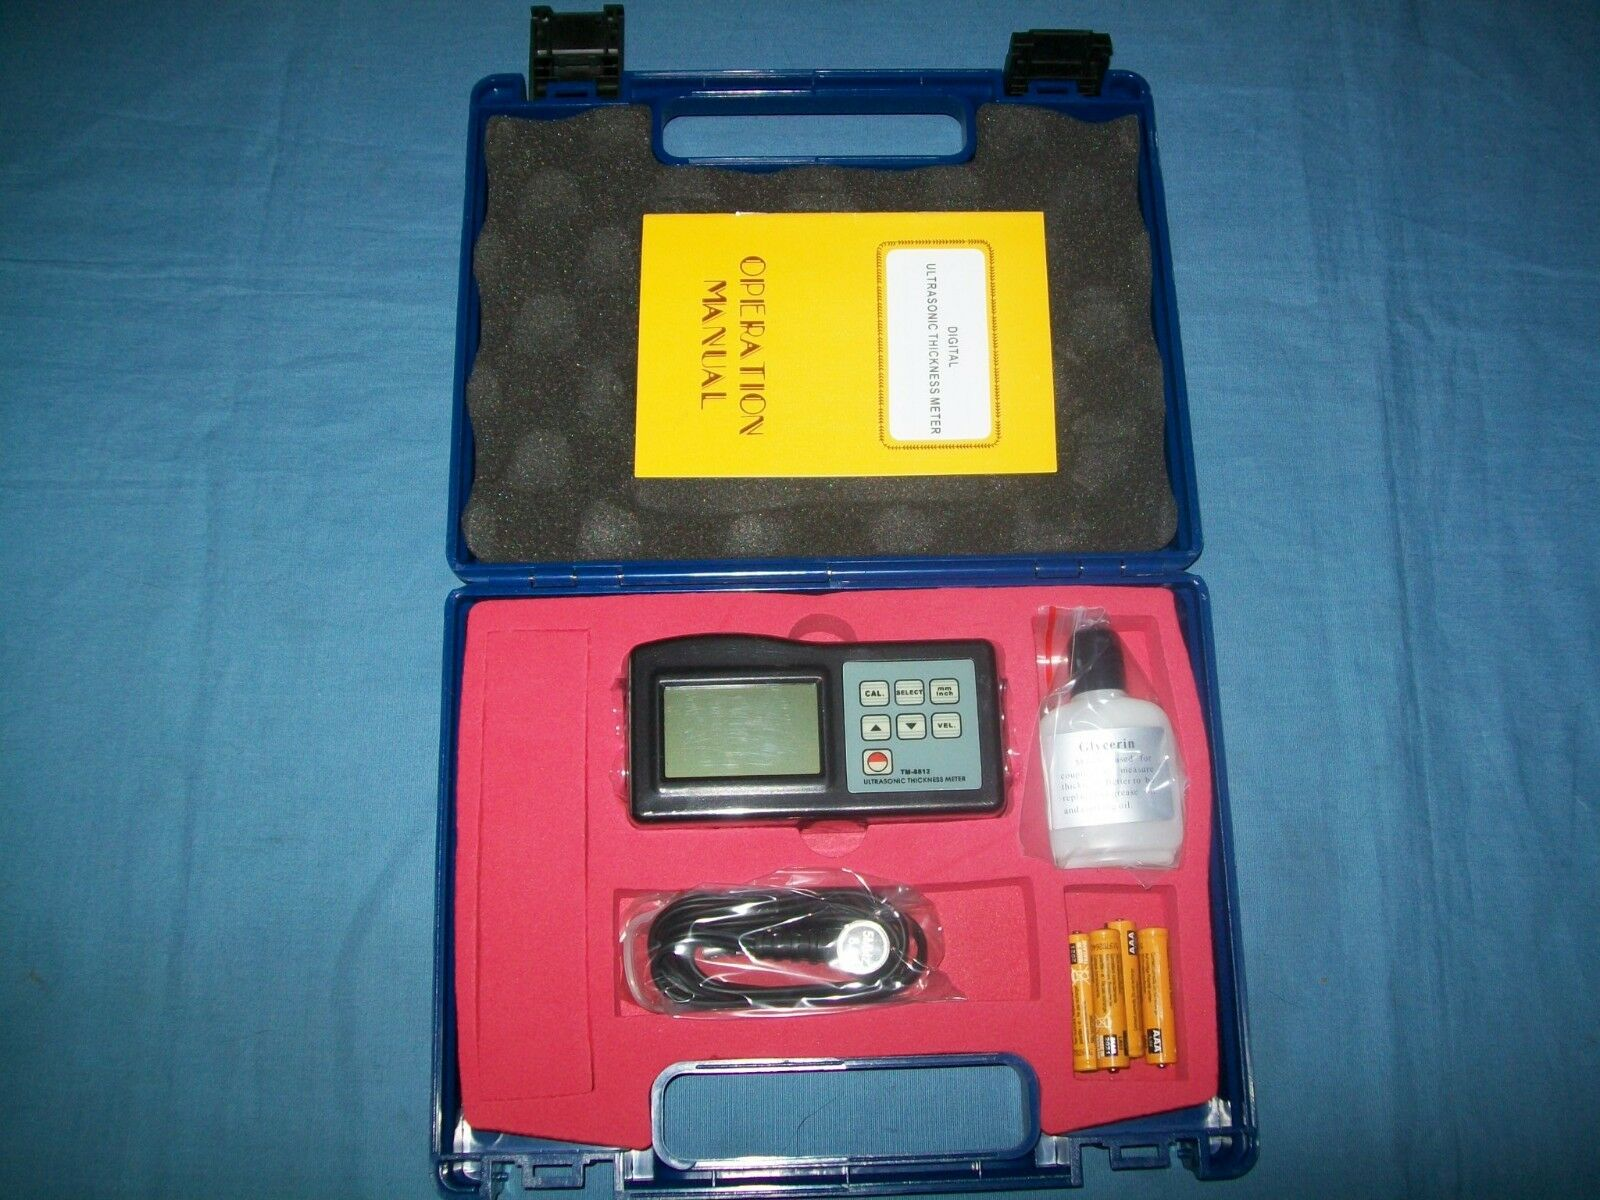 NEW GF Signet 159300012 TM-8812 Ultrasonic Thickness Gage Gauge 1.0-200 mm